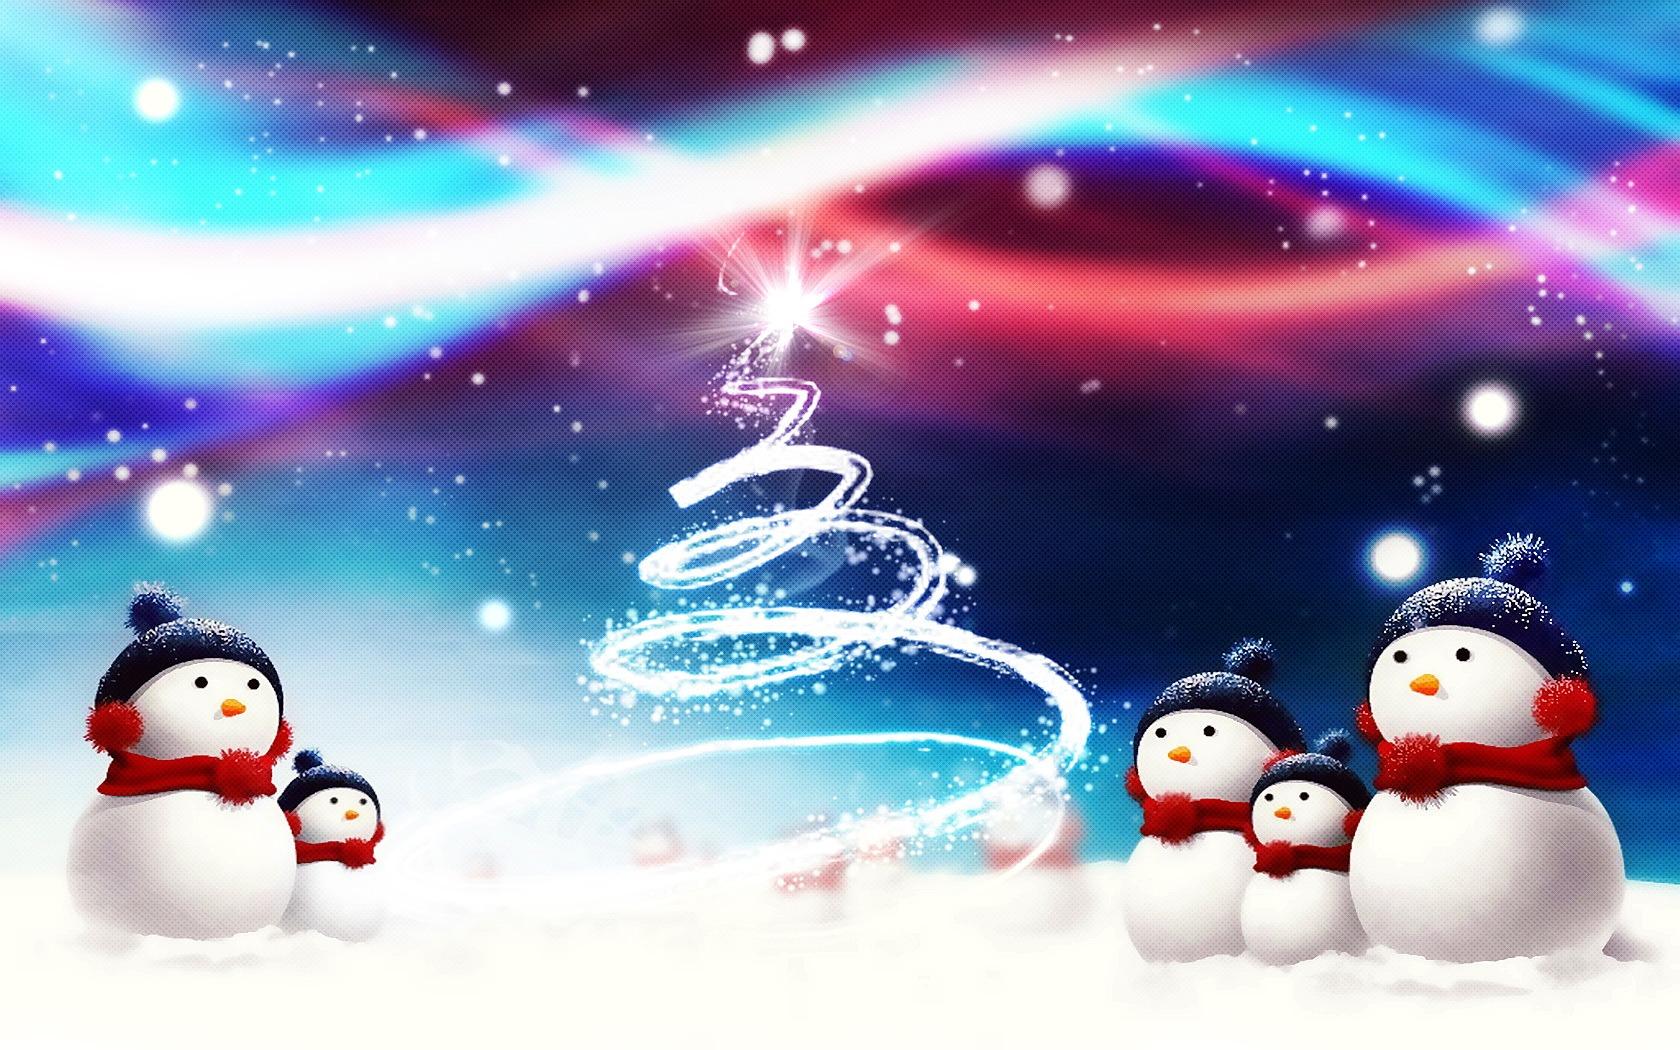 Magic Christmas Wallpaper Christmas Holidays Wallpapers in jpg ...